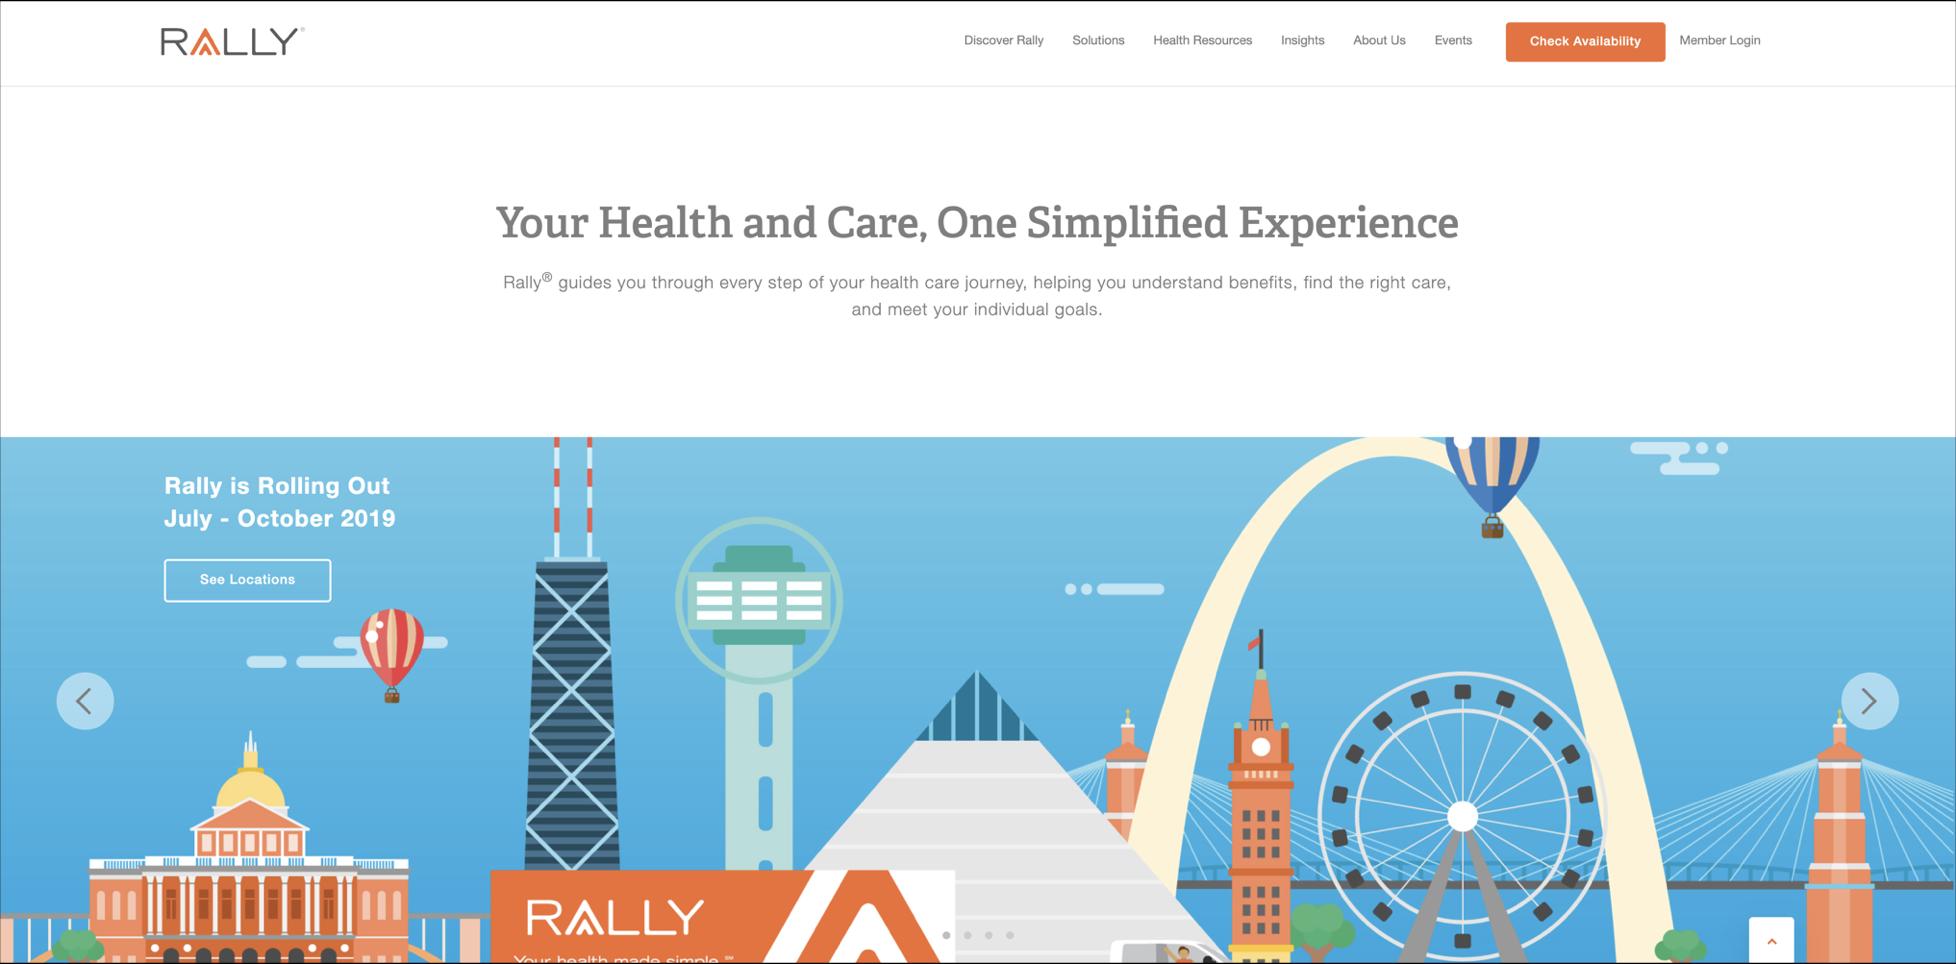 rally-homepage.png